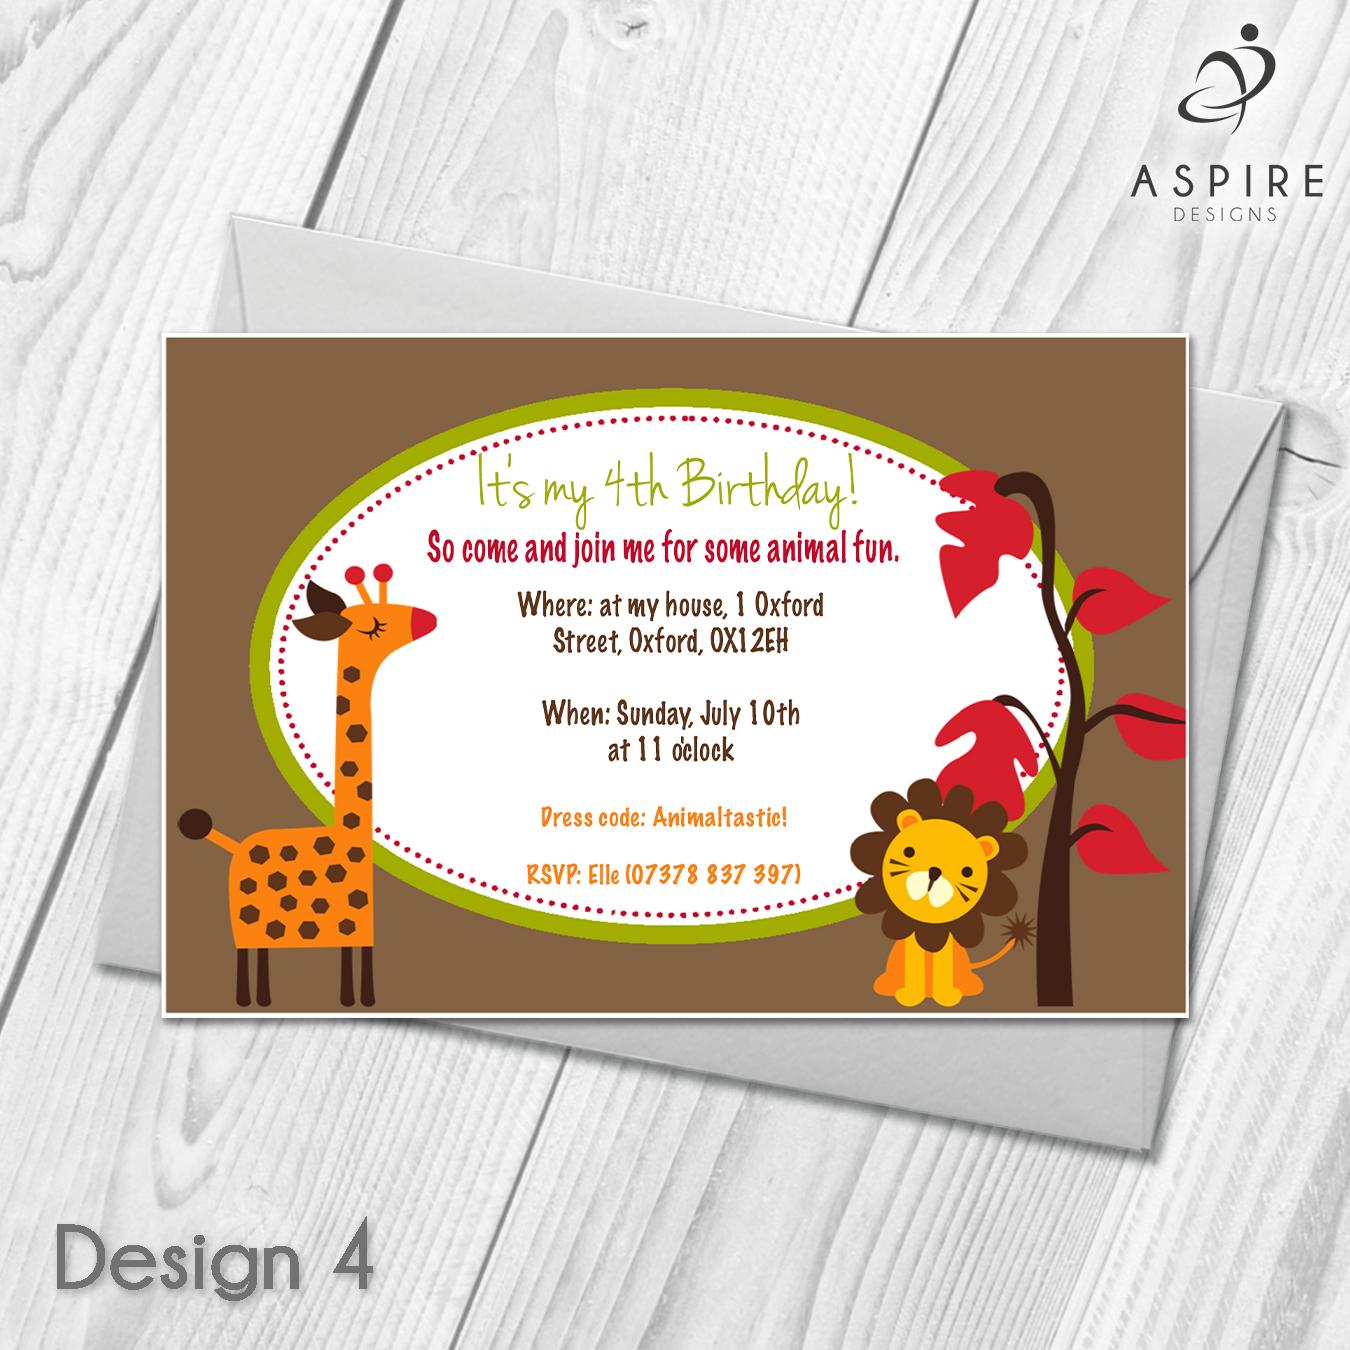 Personalised Animal Zoo Childrens Birthday Party Invitations & Envelopes